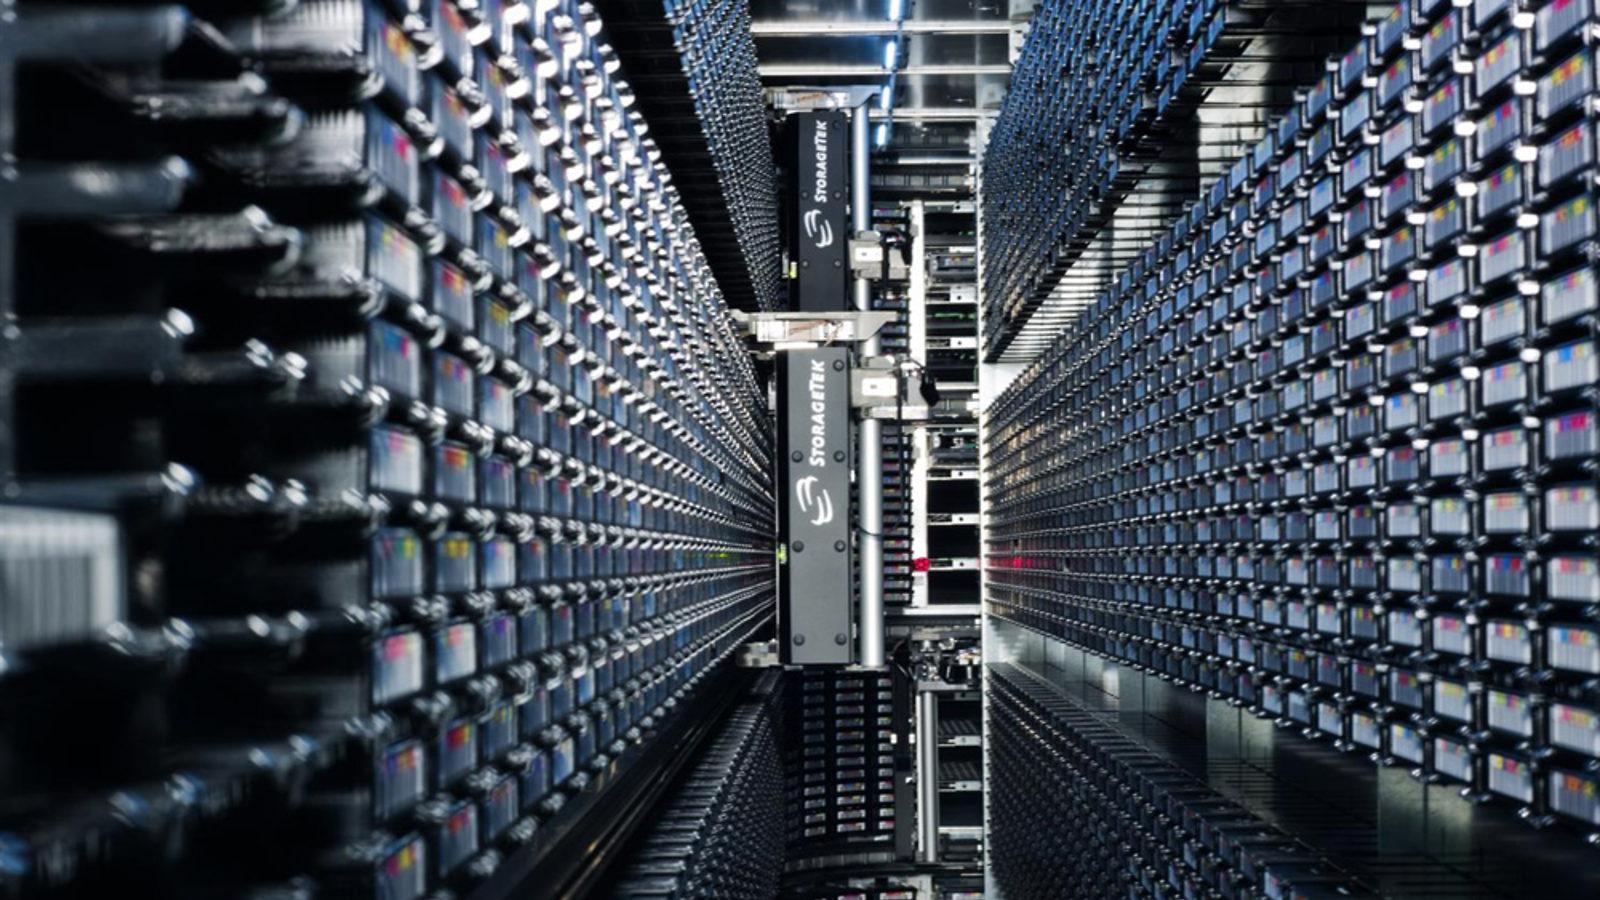 Image: 100 petabytes